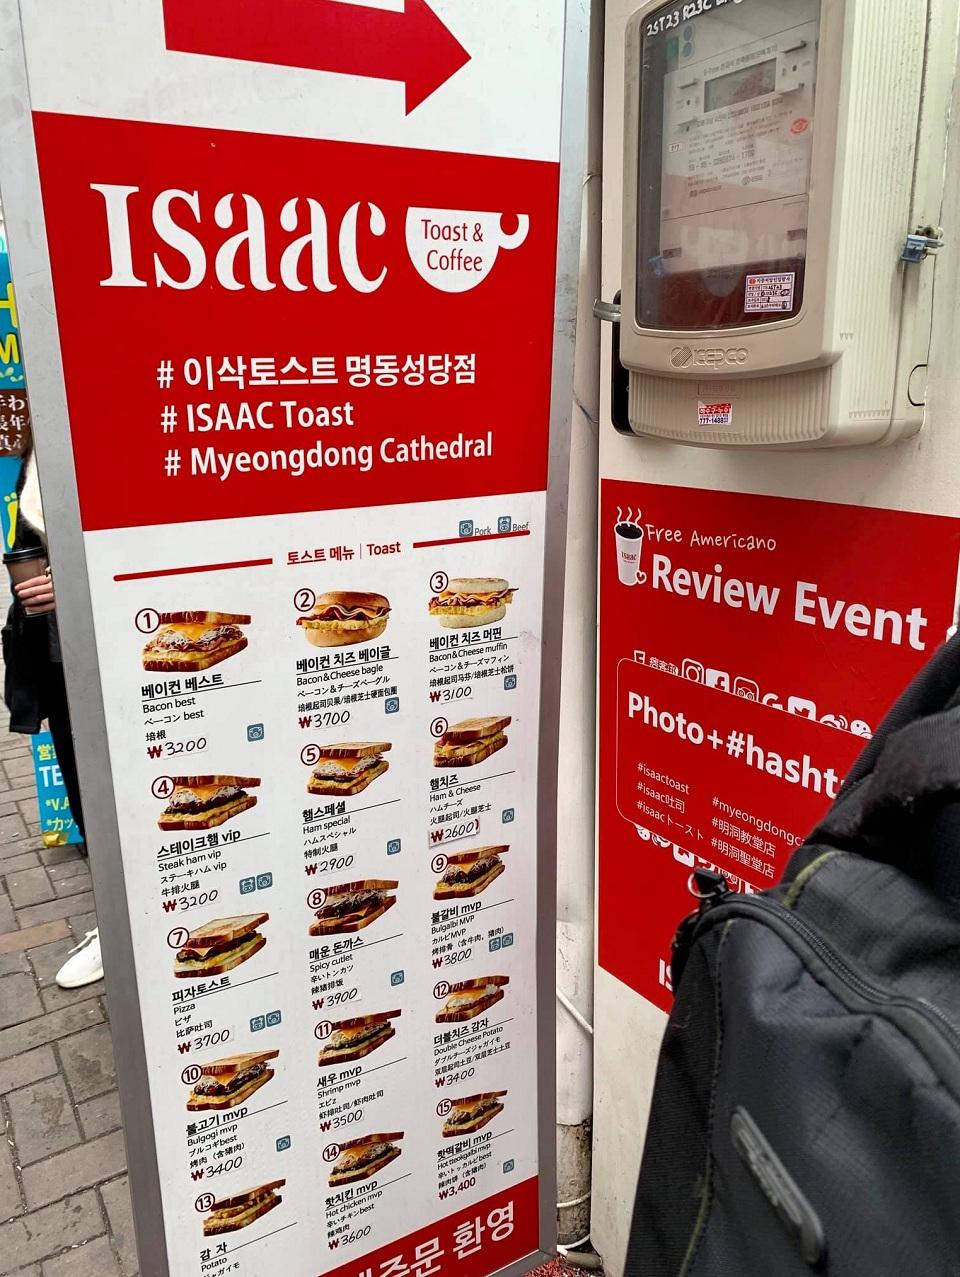 Toast & Coffee Isaac Seoul Hàn Quốc